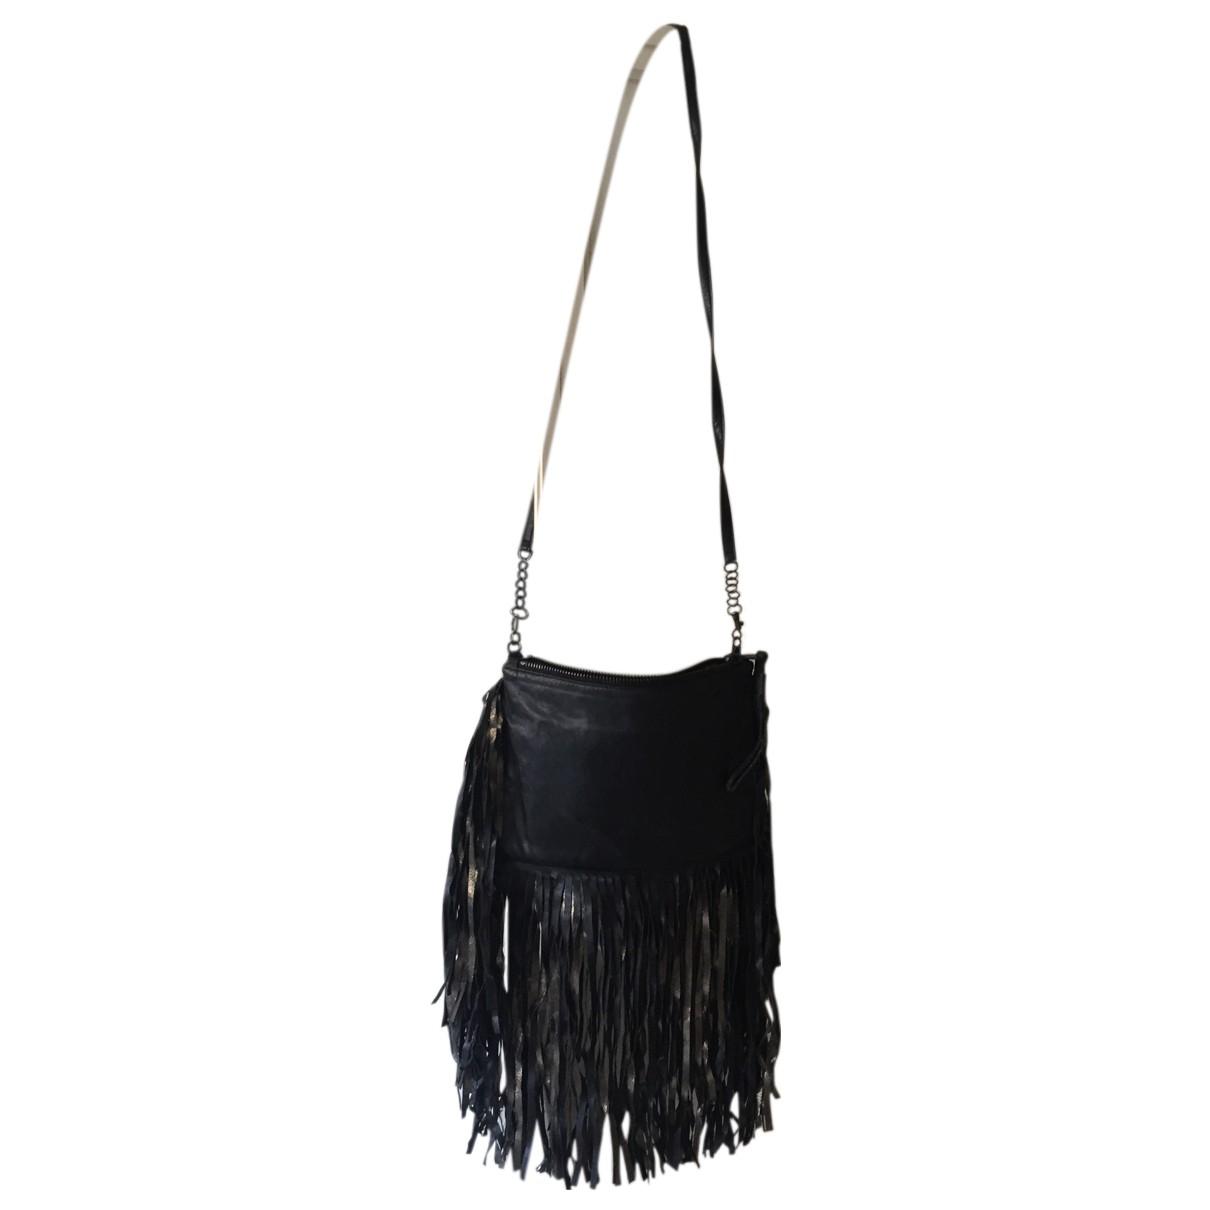 8pm \N Black Leather handbag for Women \N